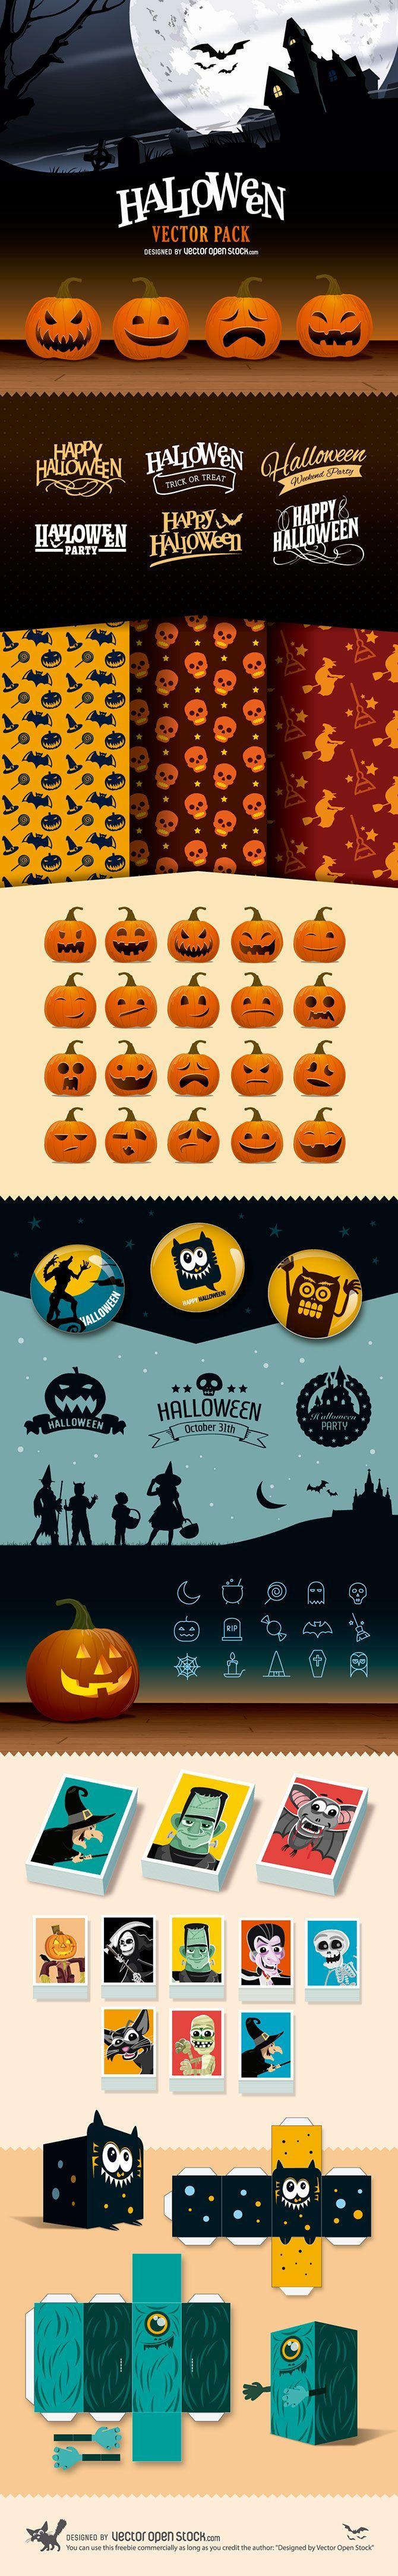 wicked design halloween freebies